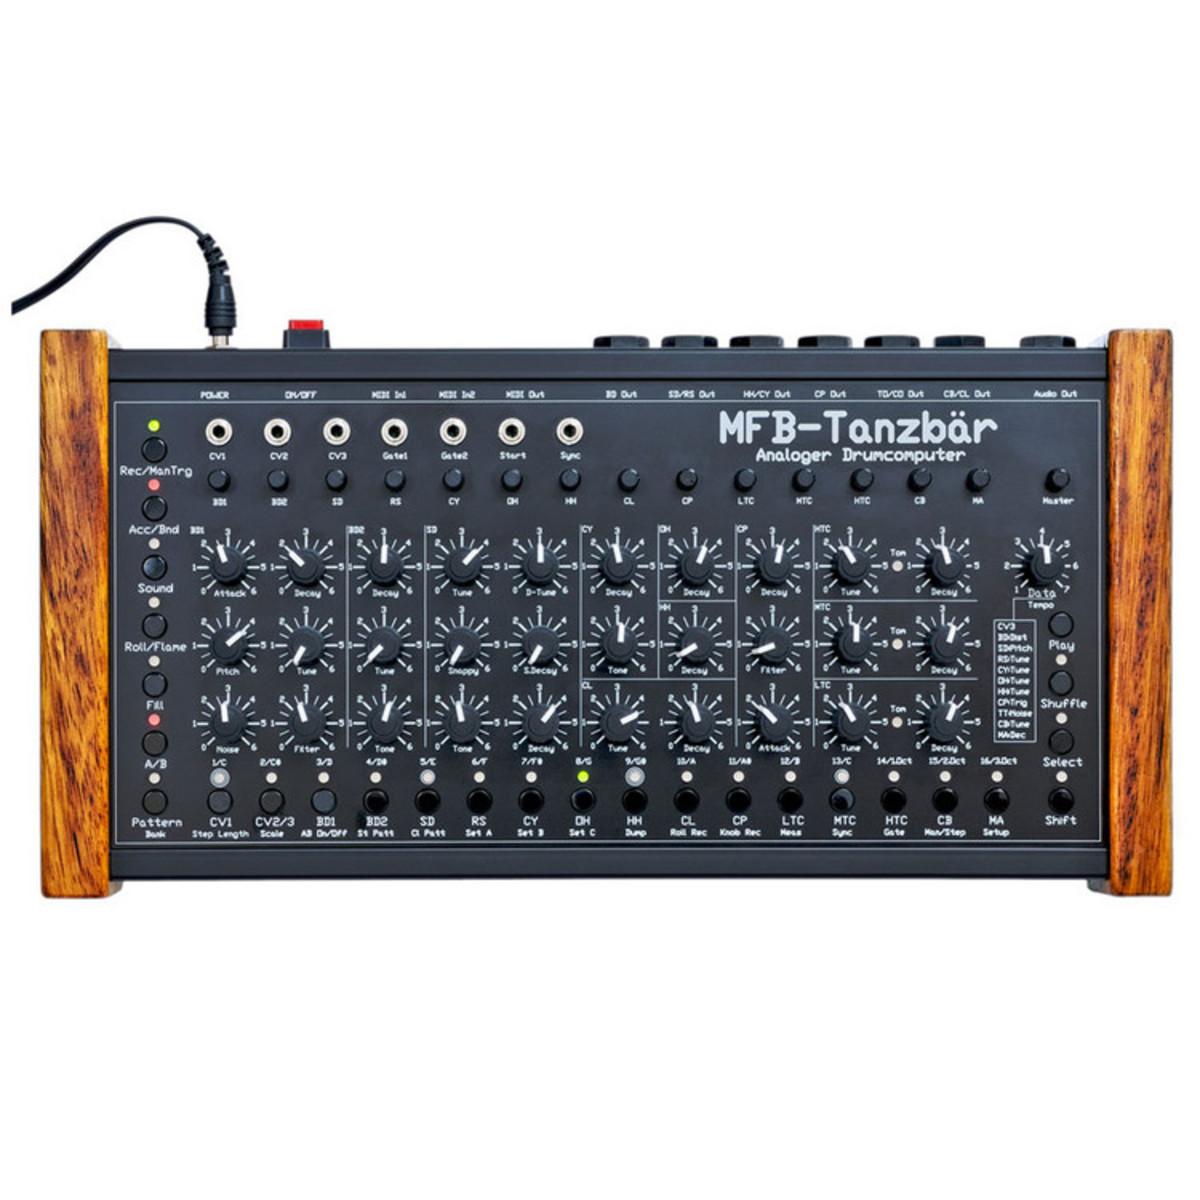 mfb tanzb r analog drum machine at gear4music. Black Bedroom Furniture Sets. Home Design Ideas